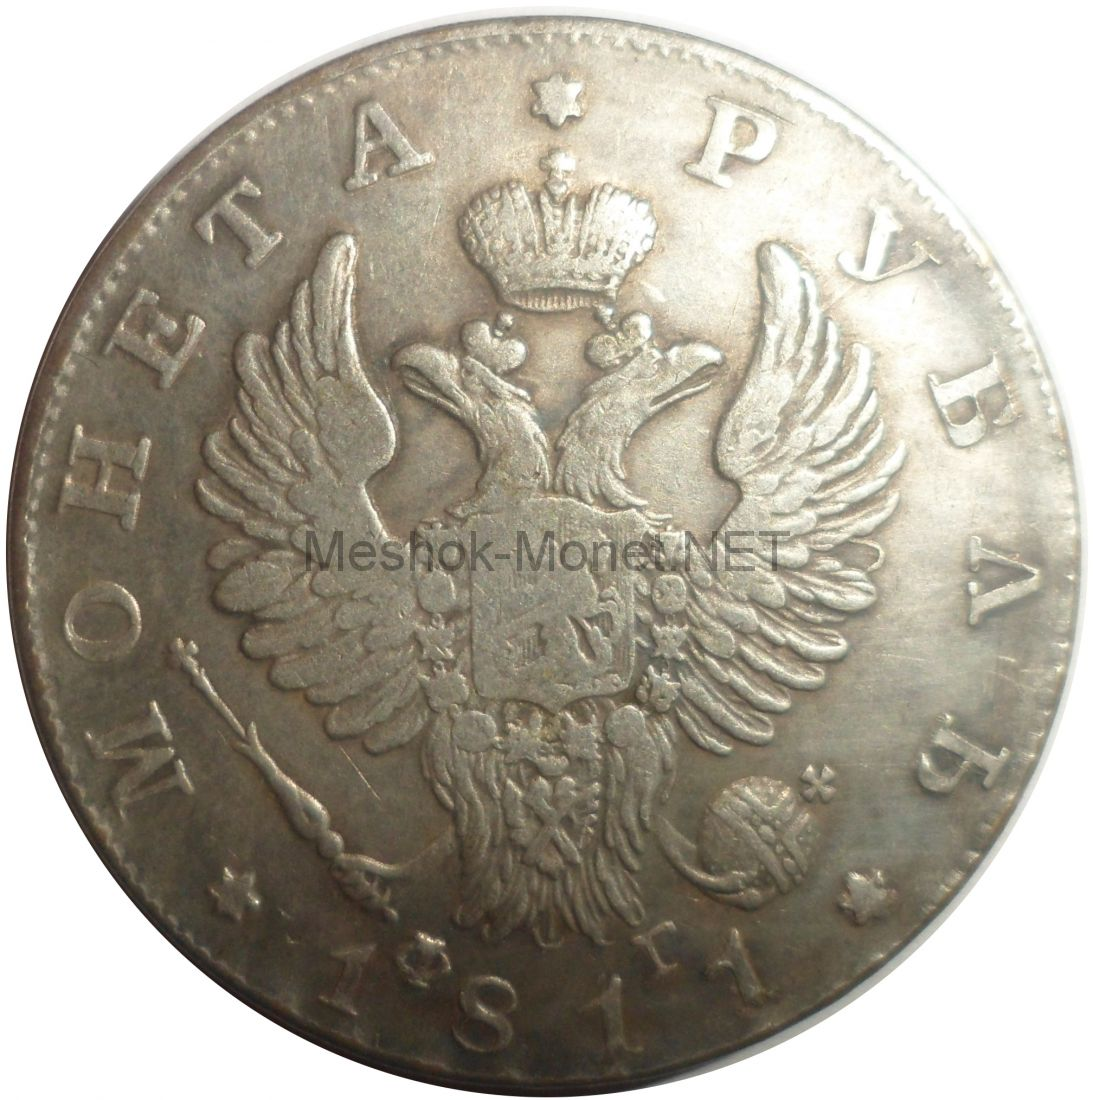 Копия монеты. Рубль 1811 года ФГ. Александра 1